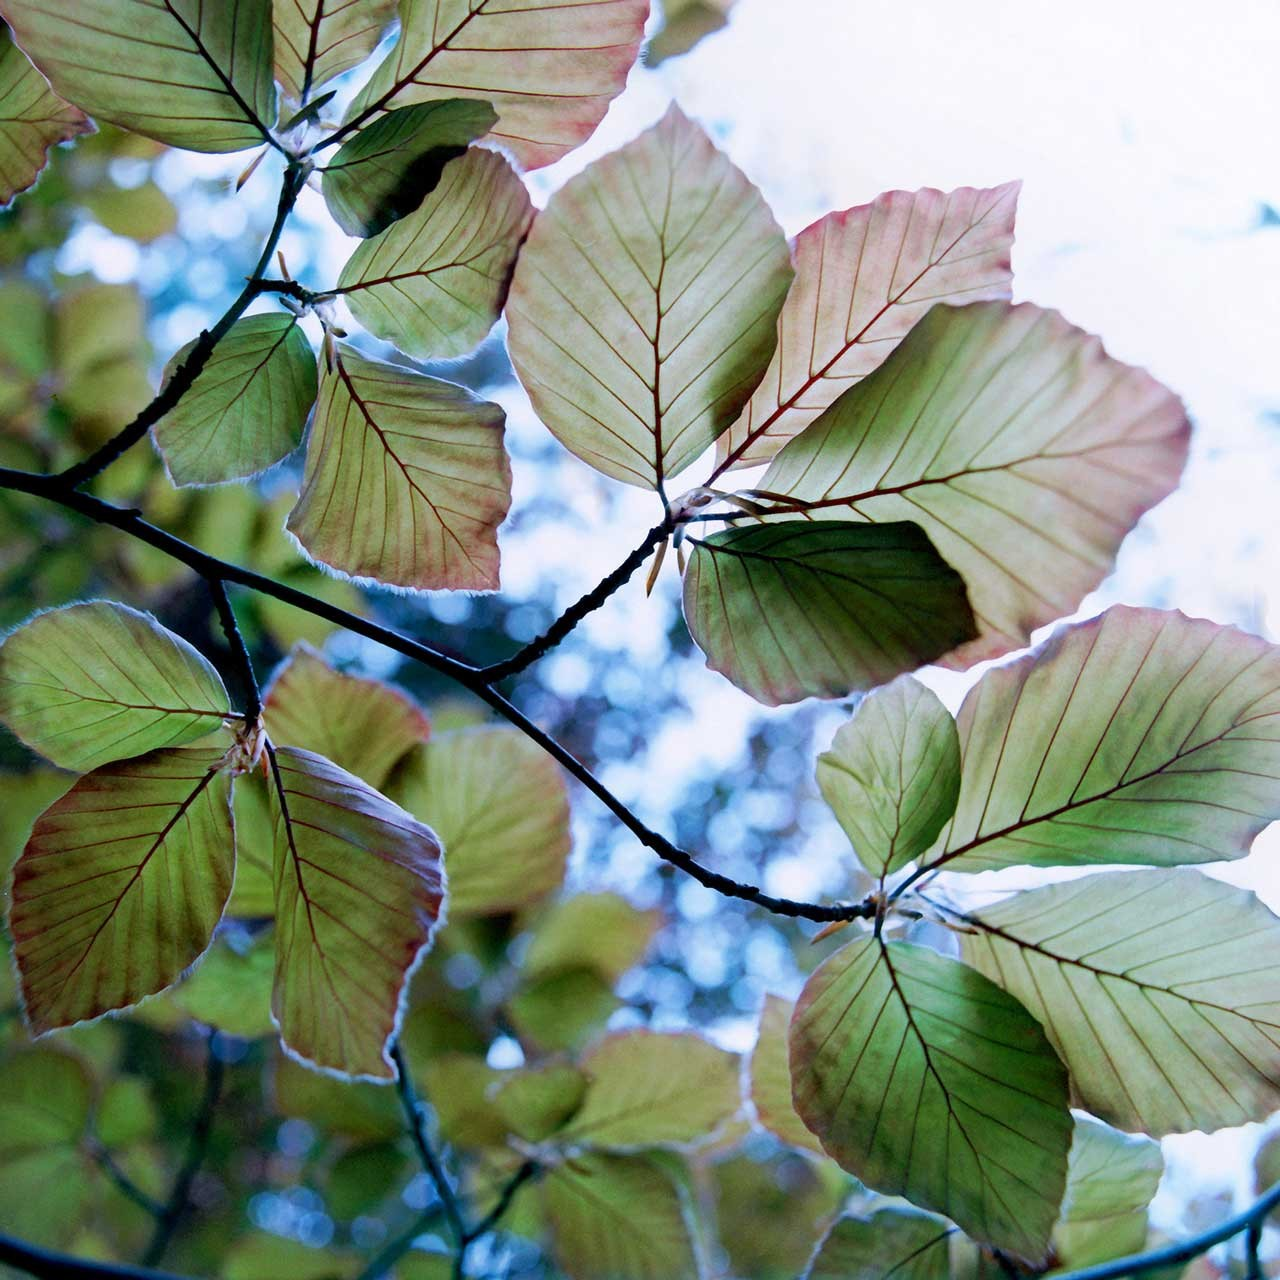 Laure-Maud_07_photographe_jardin-arbre_2